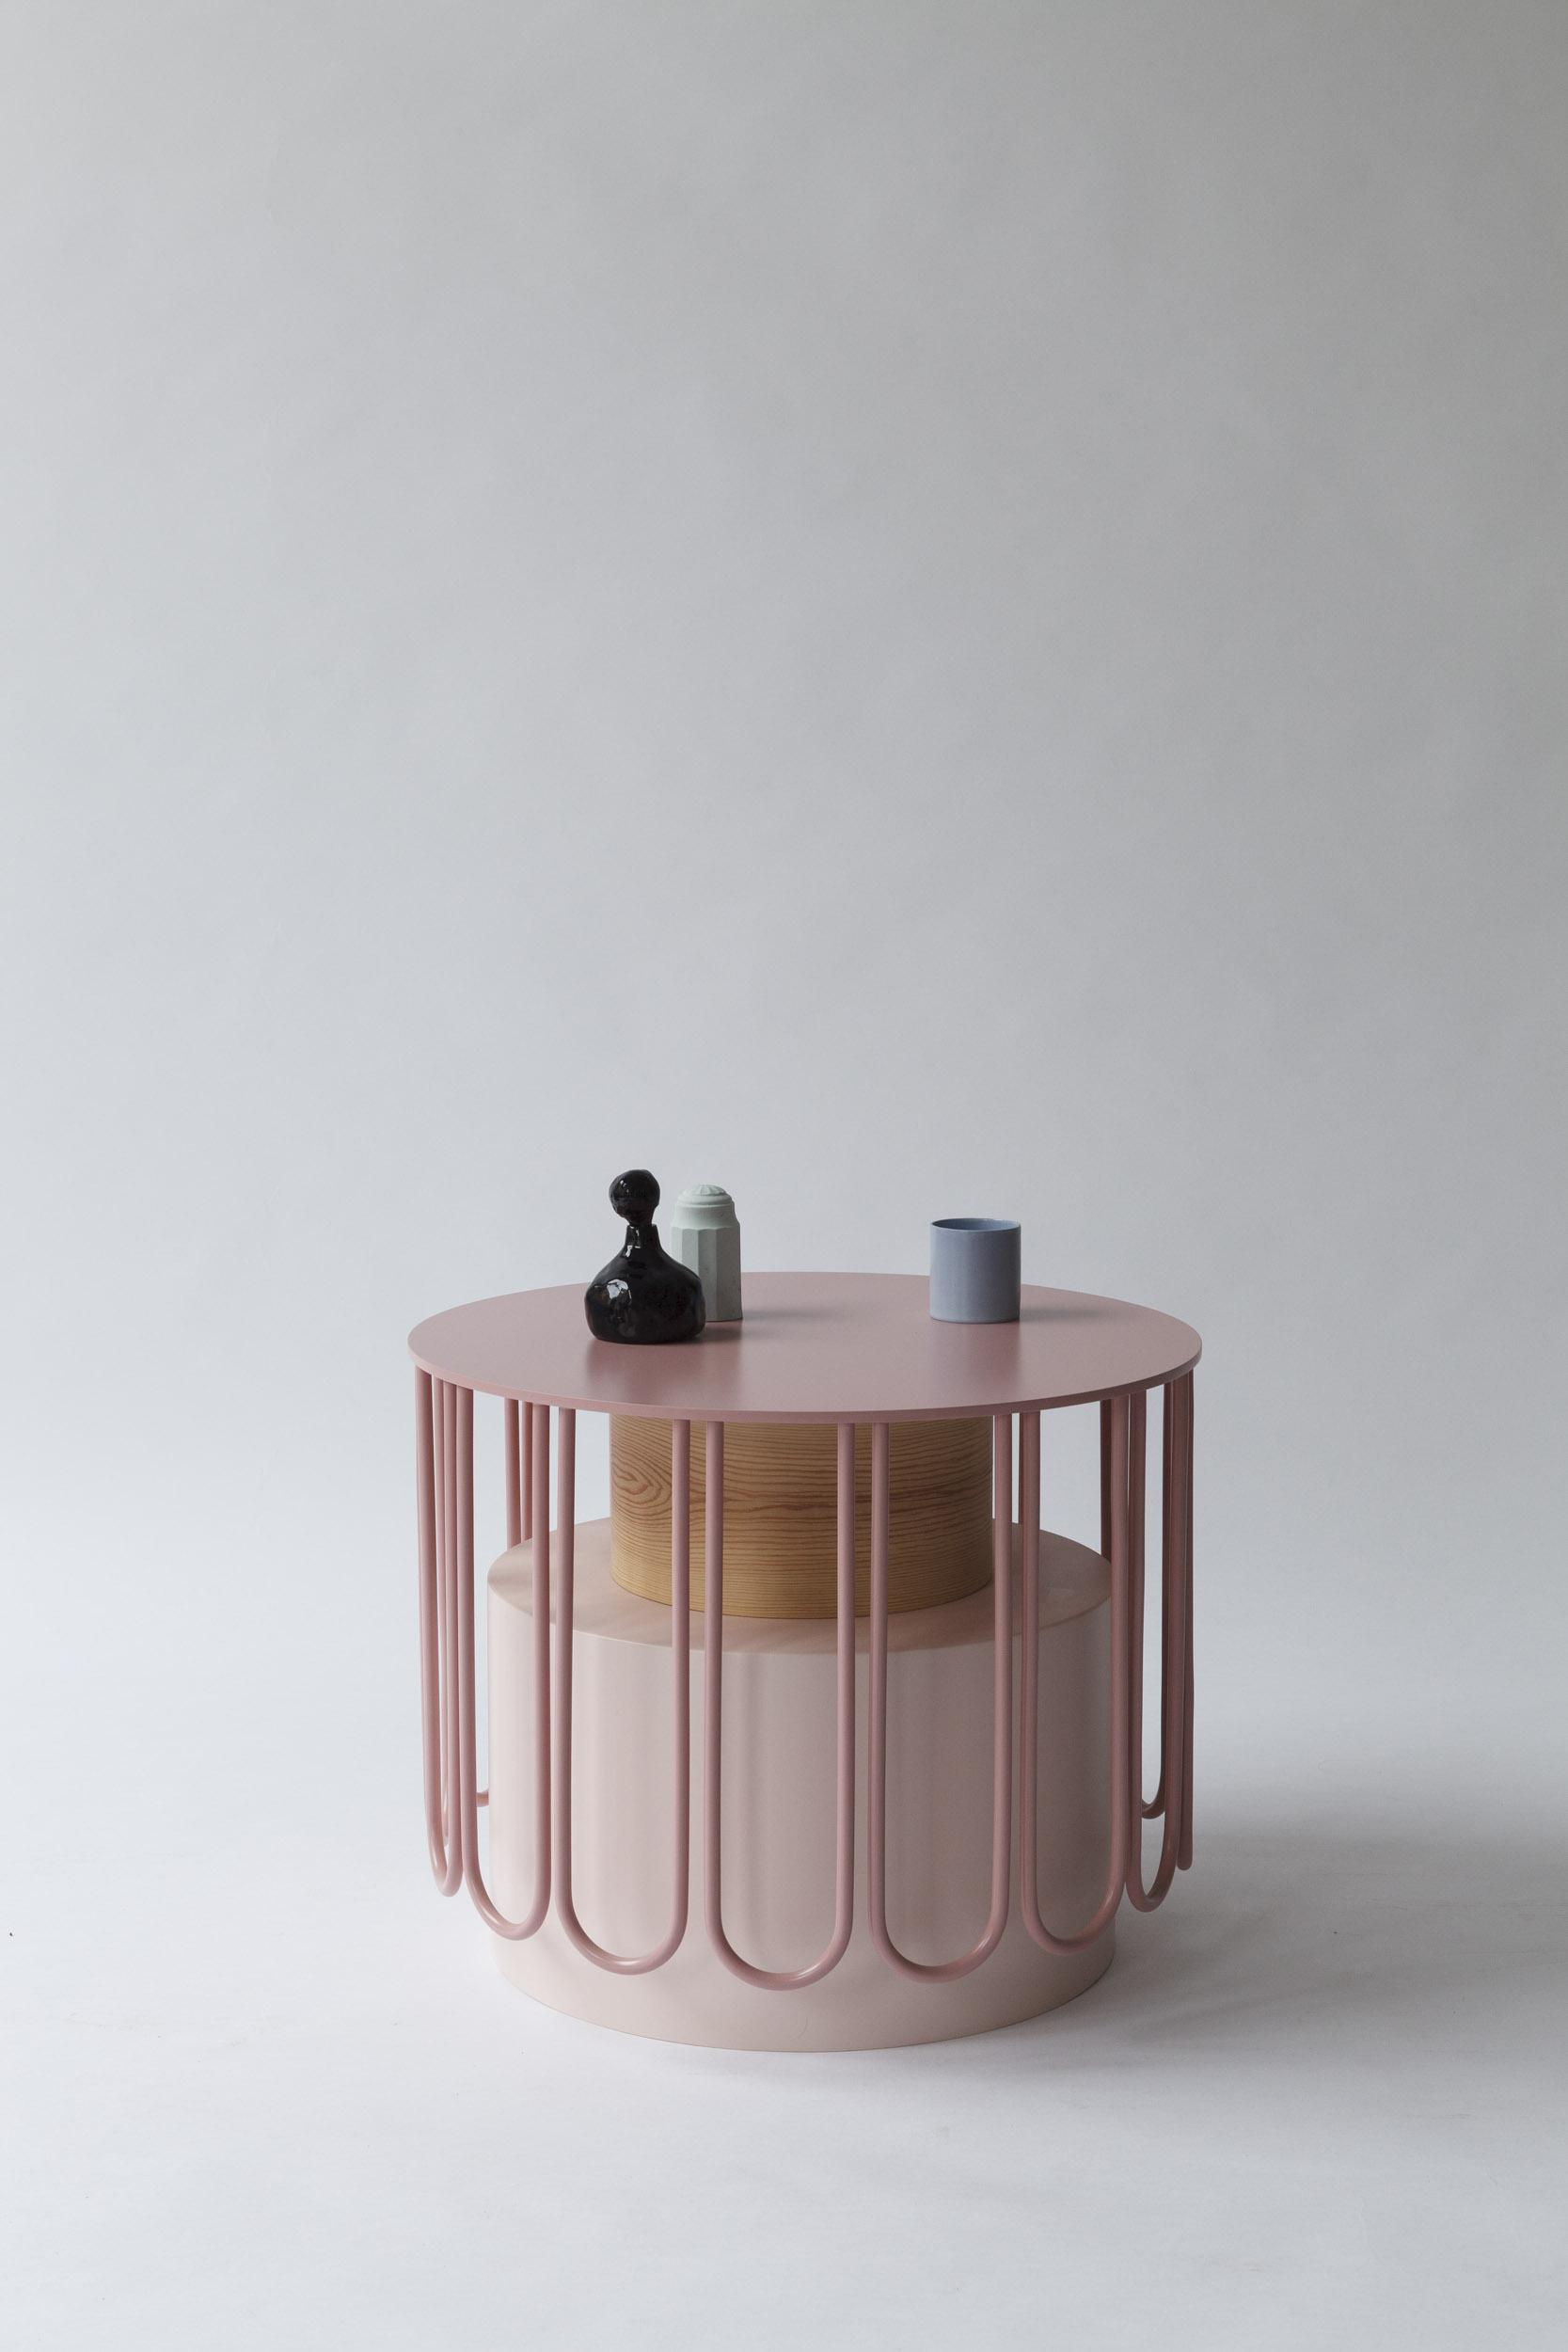 SIDE TABLE TUTU SMALL,  WOOD, ALUMINIUM, PVC, LACQUERED MDF  52 x 52 x 40cm